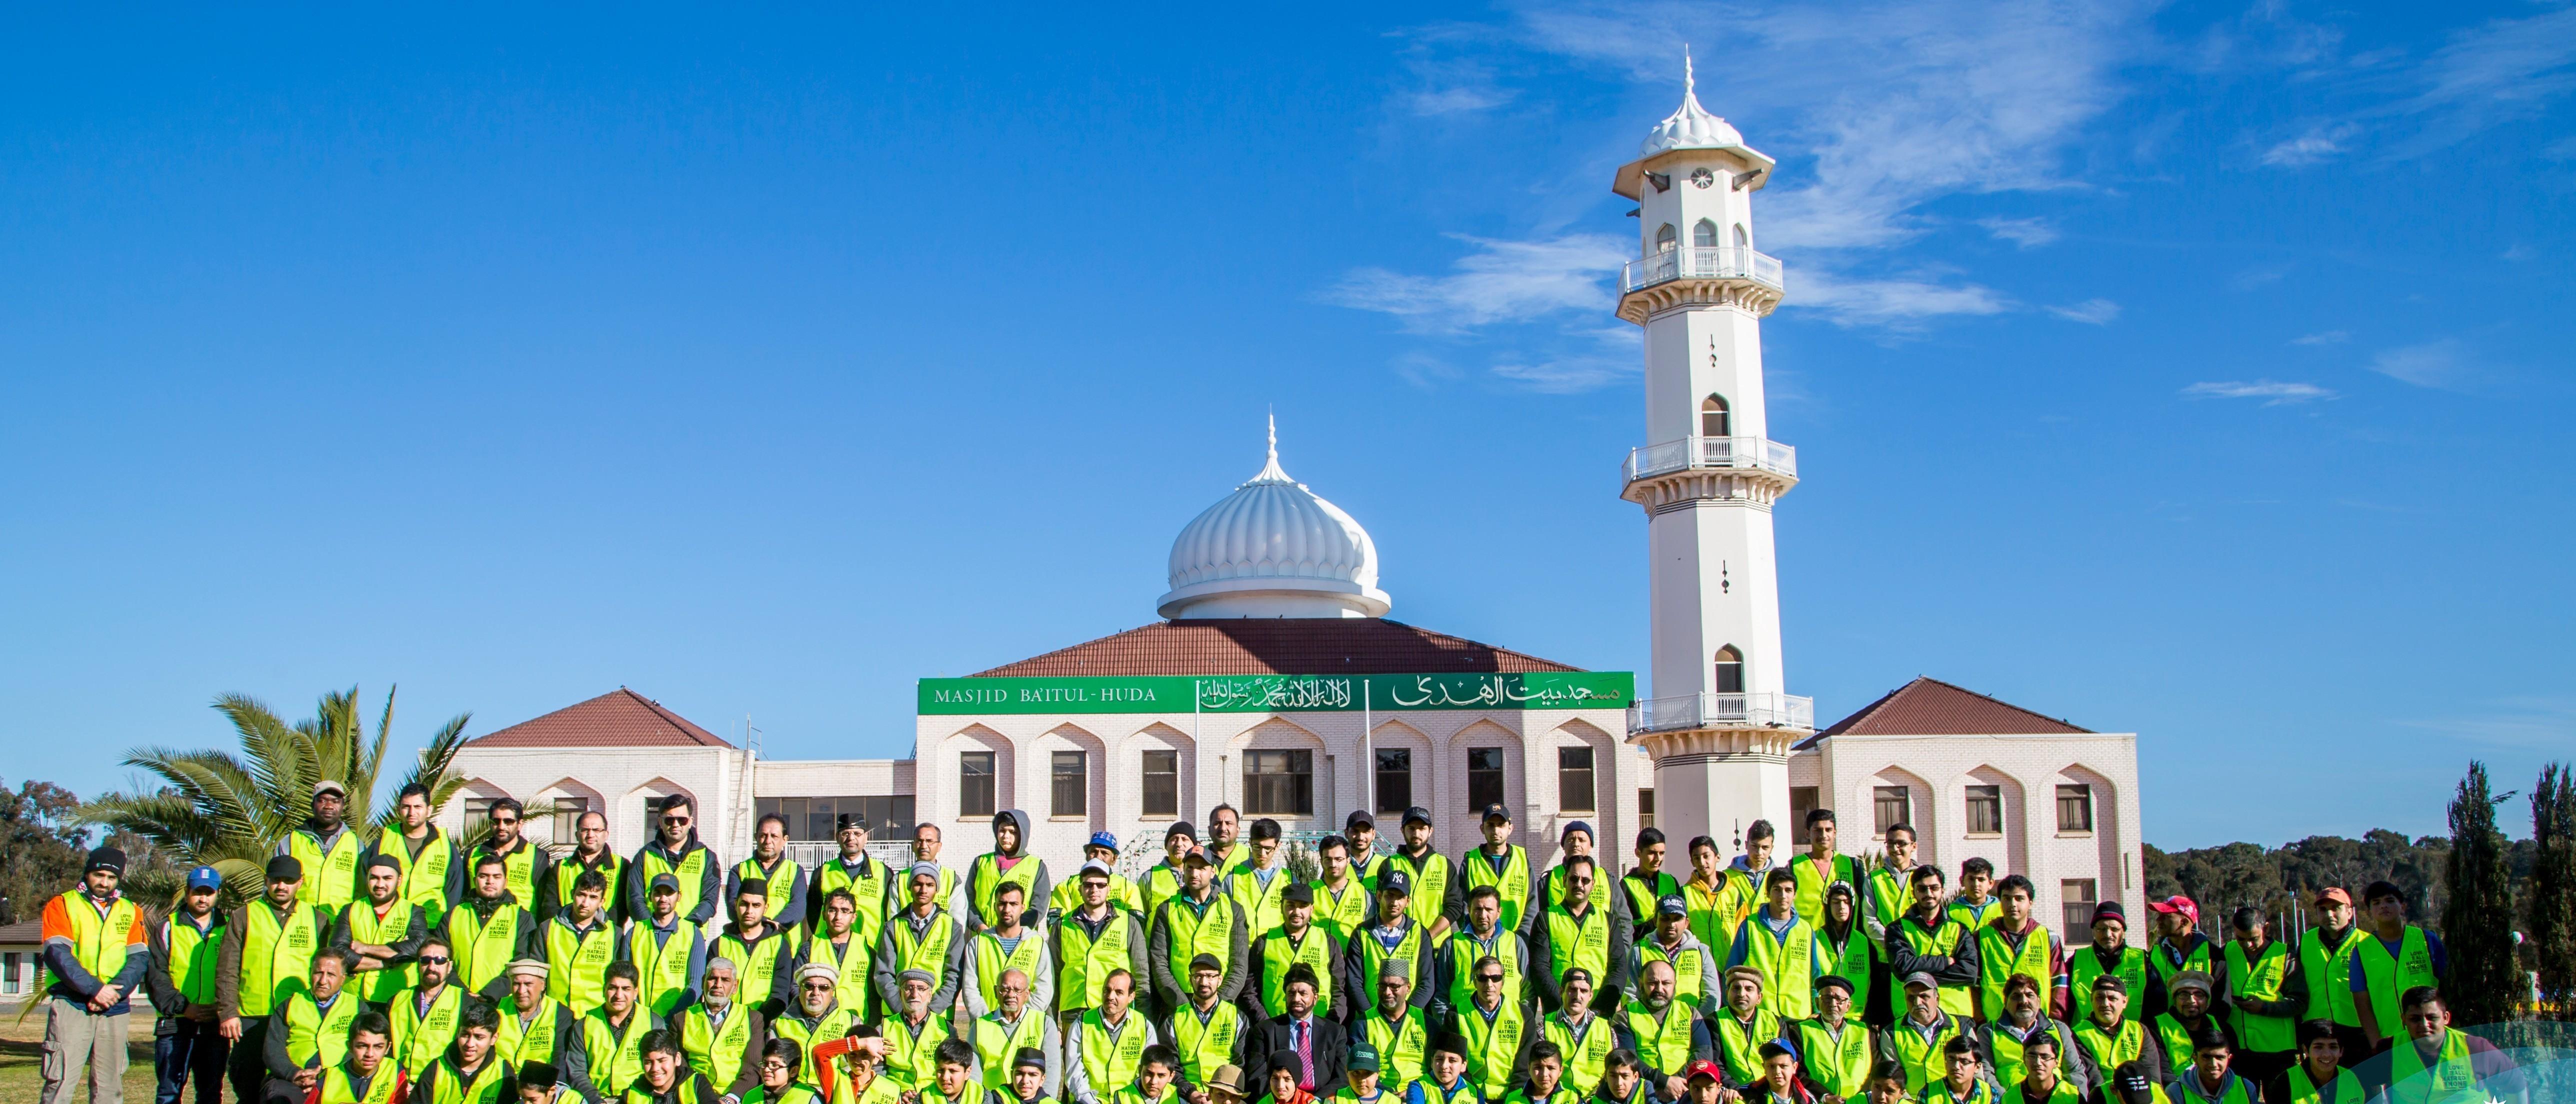 Ahmadi Muslims NSW - Baitul Huda Mosque (Ladies)